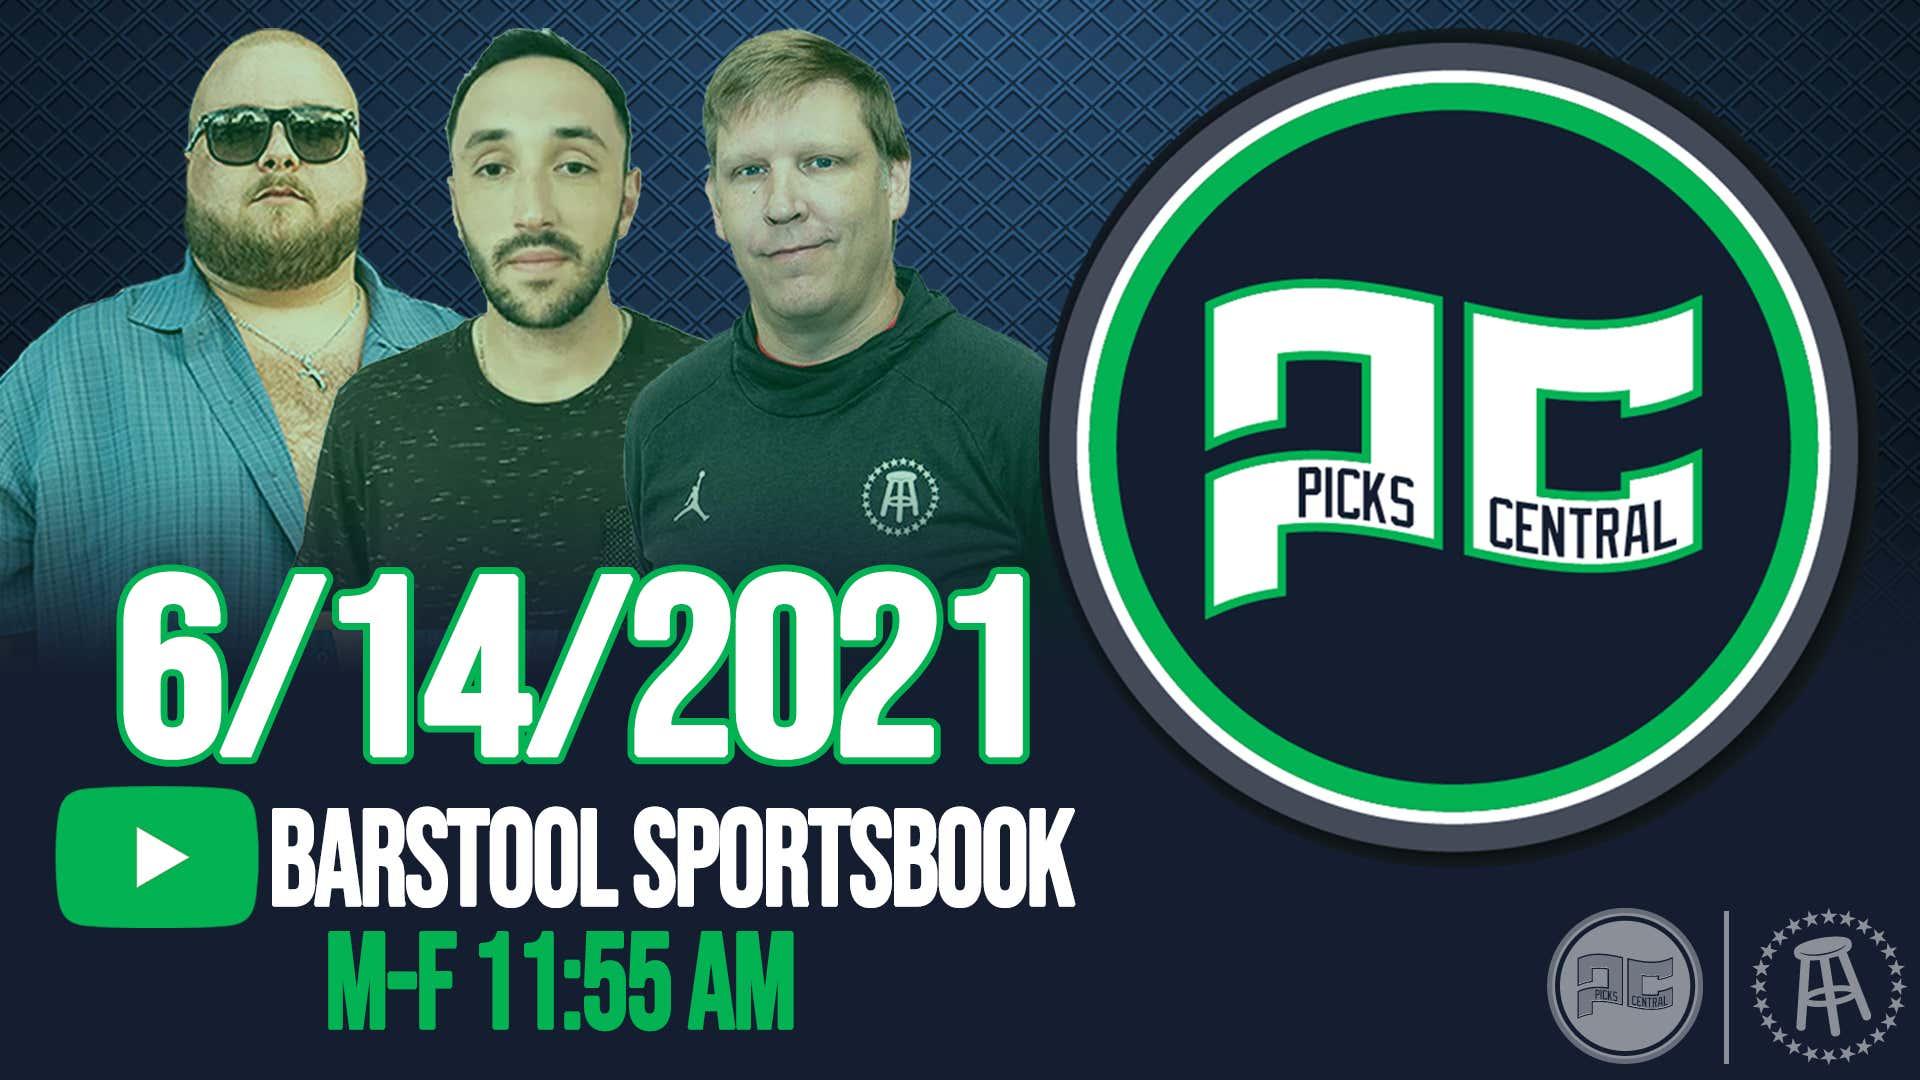 Barstool Sports Picks Central   Monday, June 14th, 2021